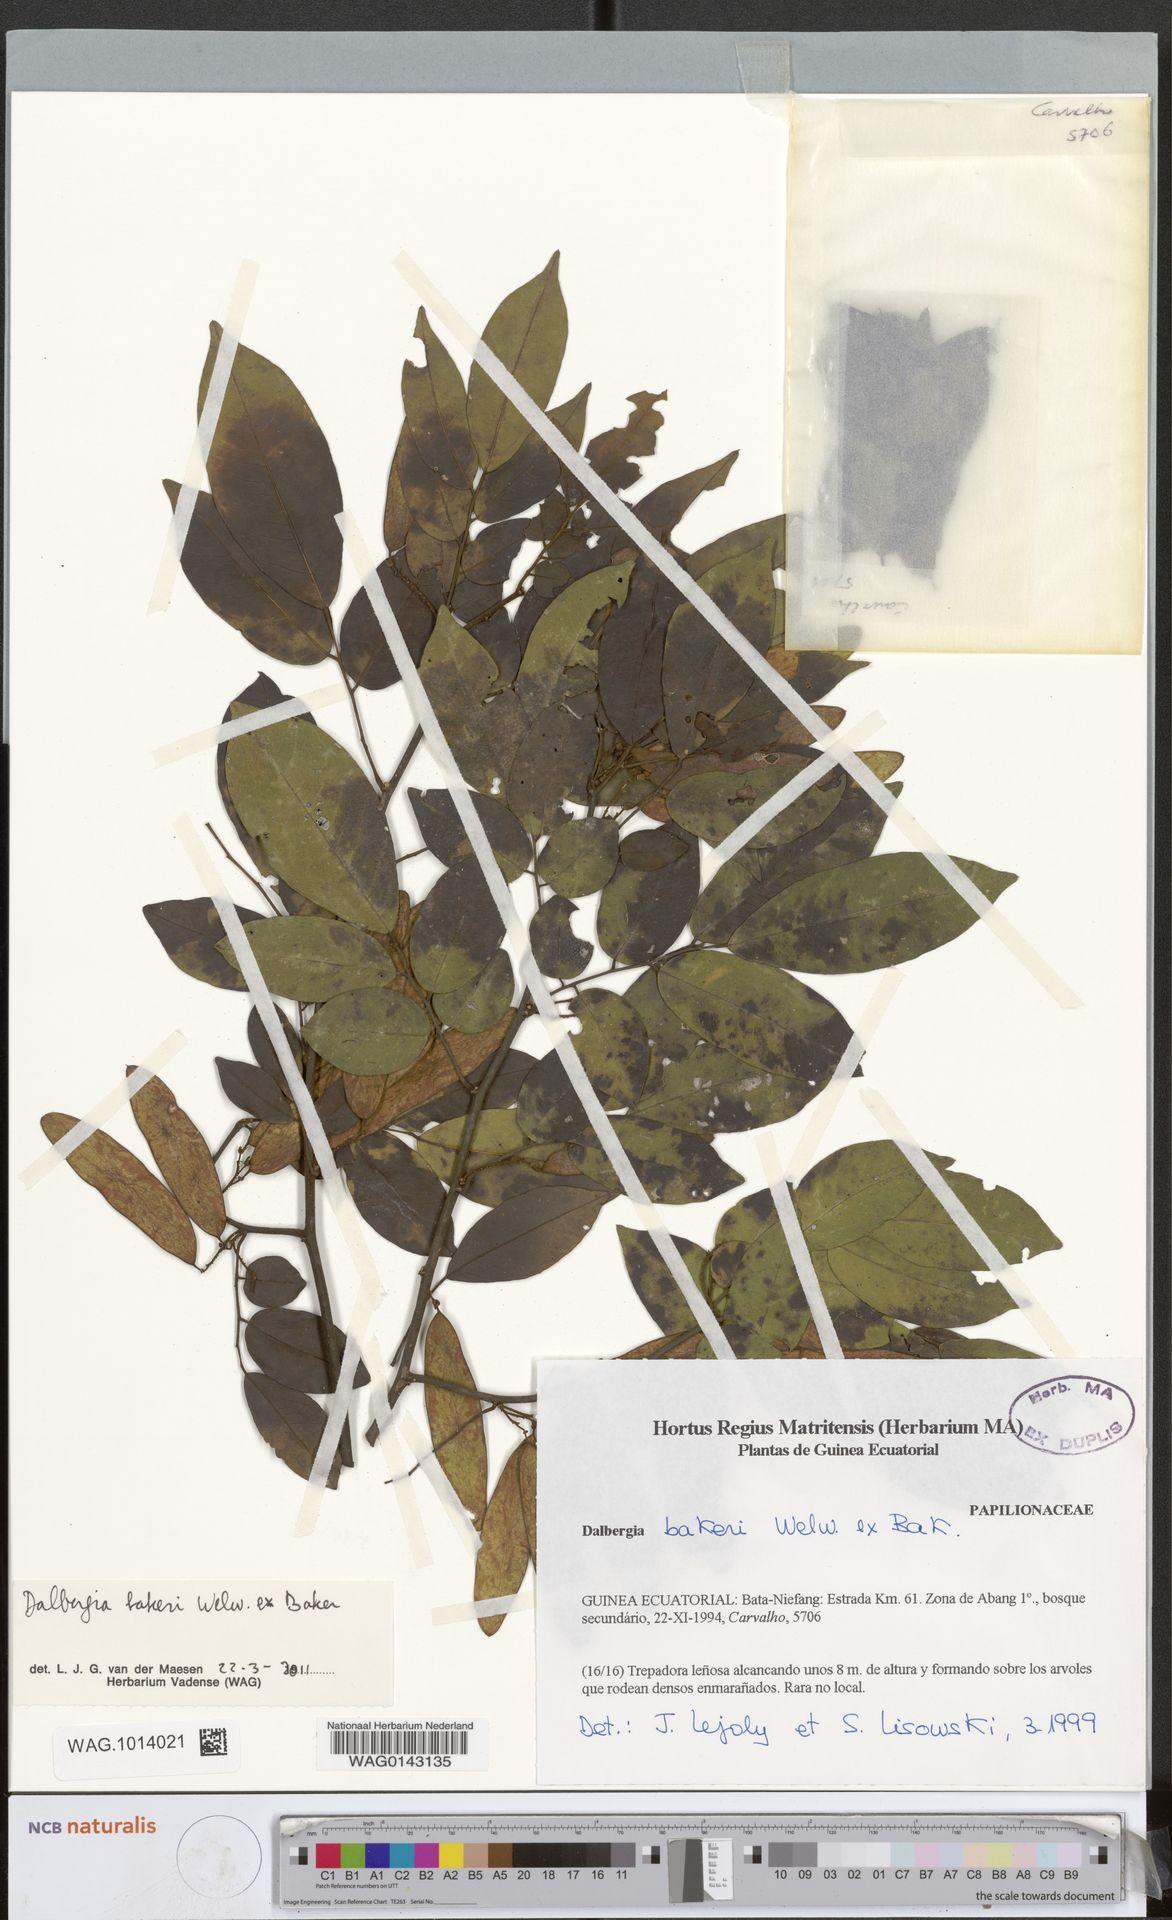 WAG.1014021 | Dalbergia adamii subsp. erectipilis O.Lachenaud